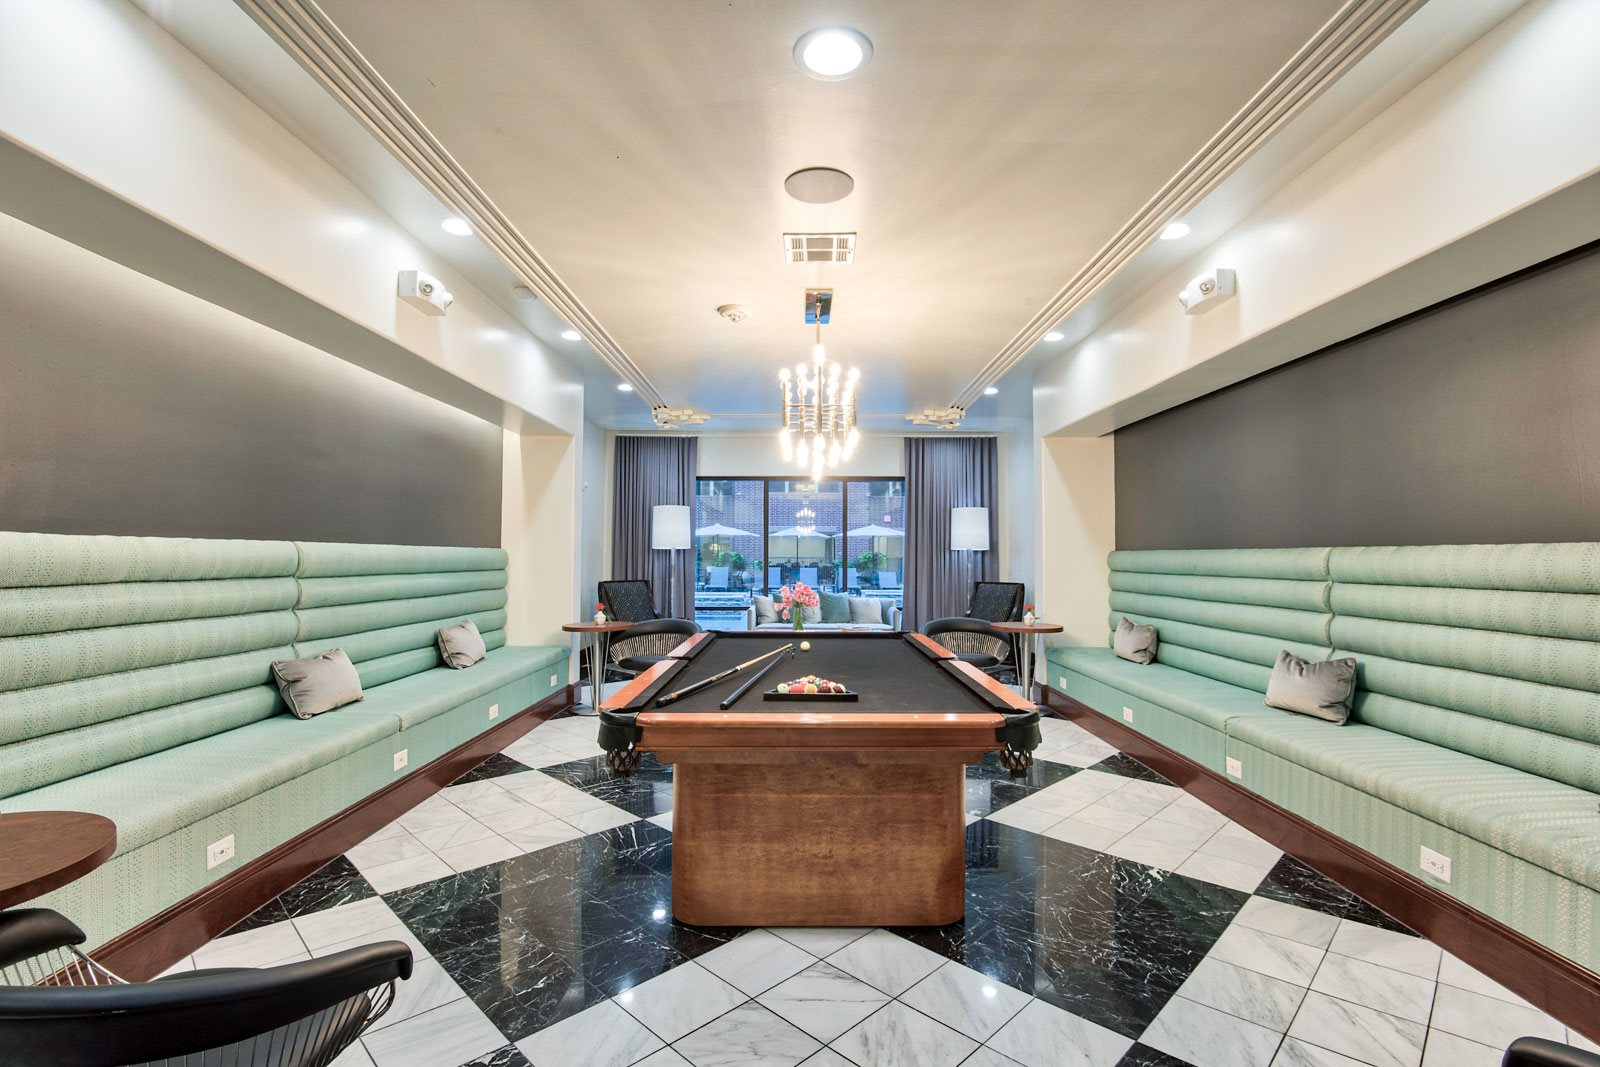 Billiards Room at Midtown Houston by Windsor, 2310 Main Street, Houston